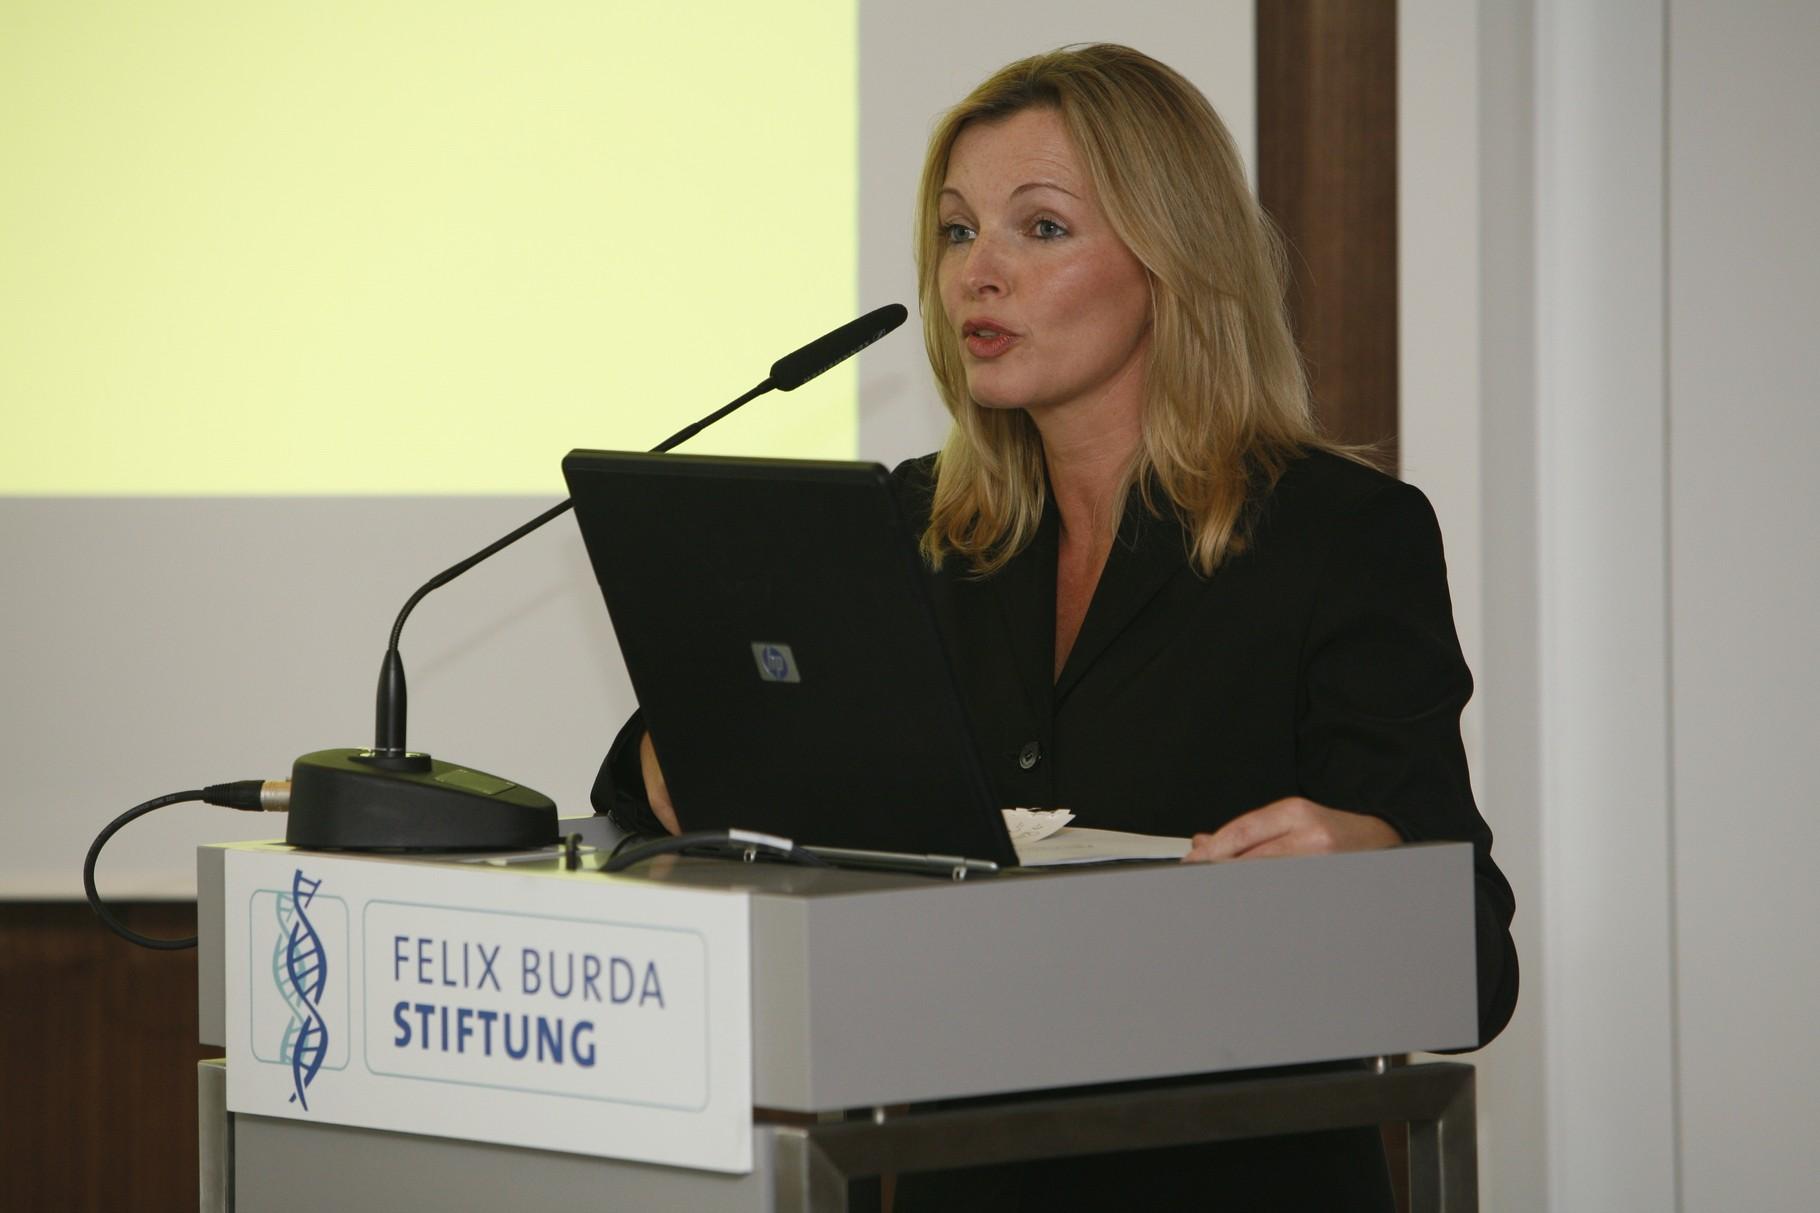 Foto: Pressekonferenz der Felix Burda Stiftung